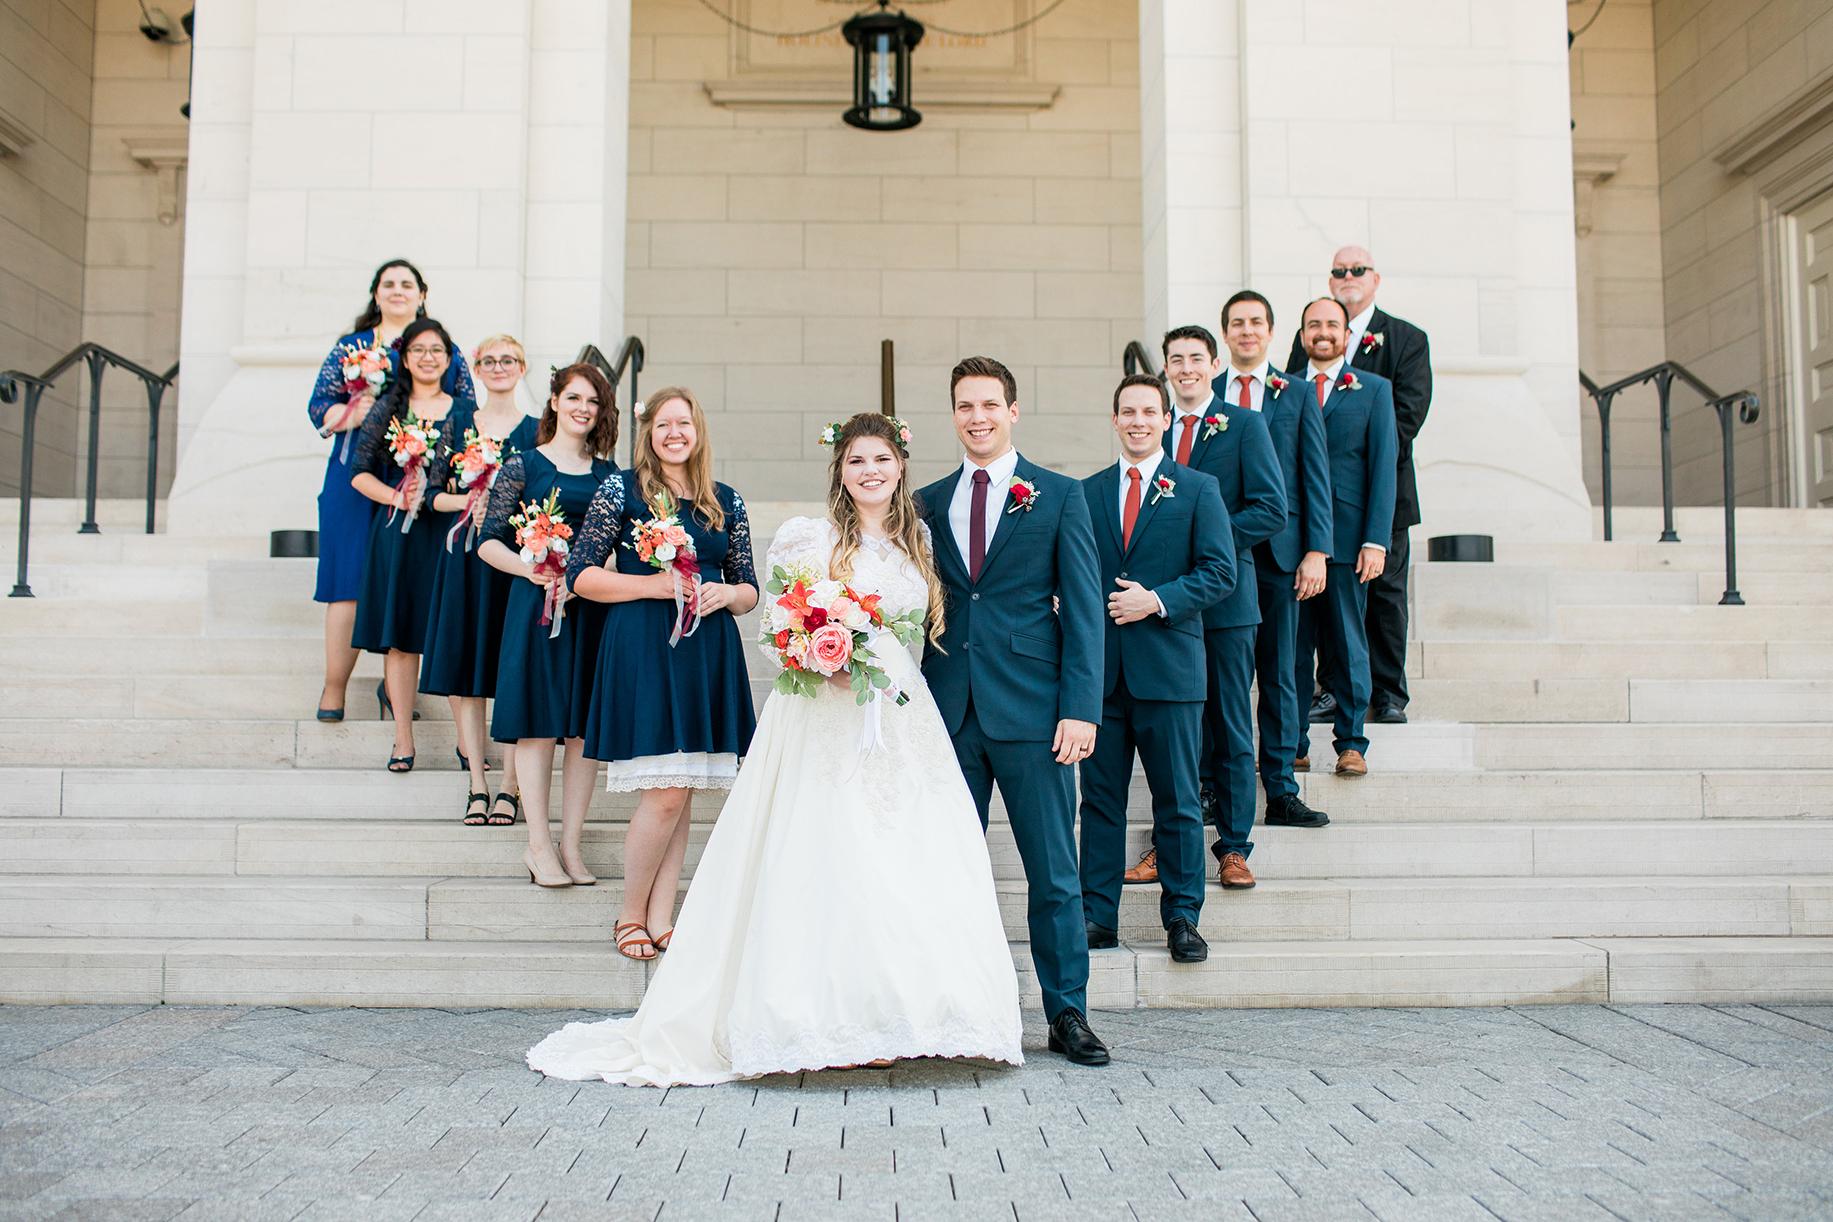 Jared Gabby Wedding August 1 2018-print-0096.jpg